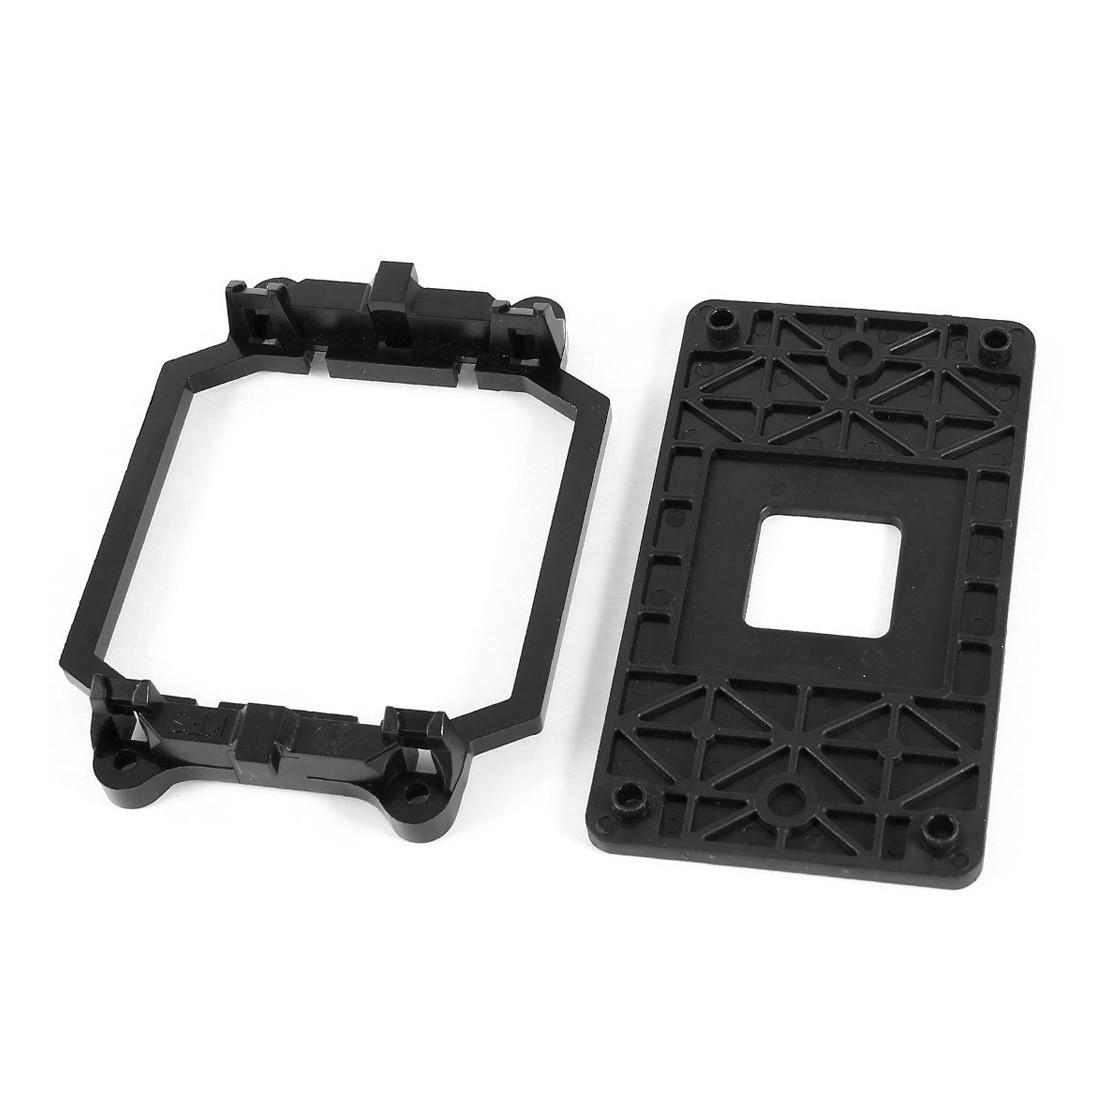 CPU fan base black plastic for AMD AM2 AM3 socketCPU fan base black plastic for AMD AM2 AM3 socket